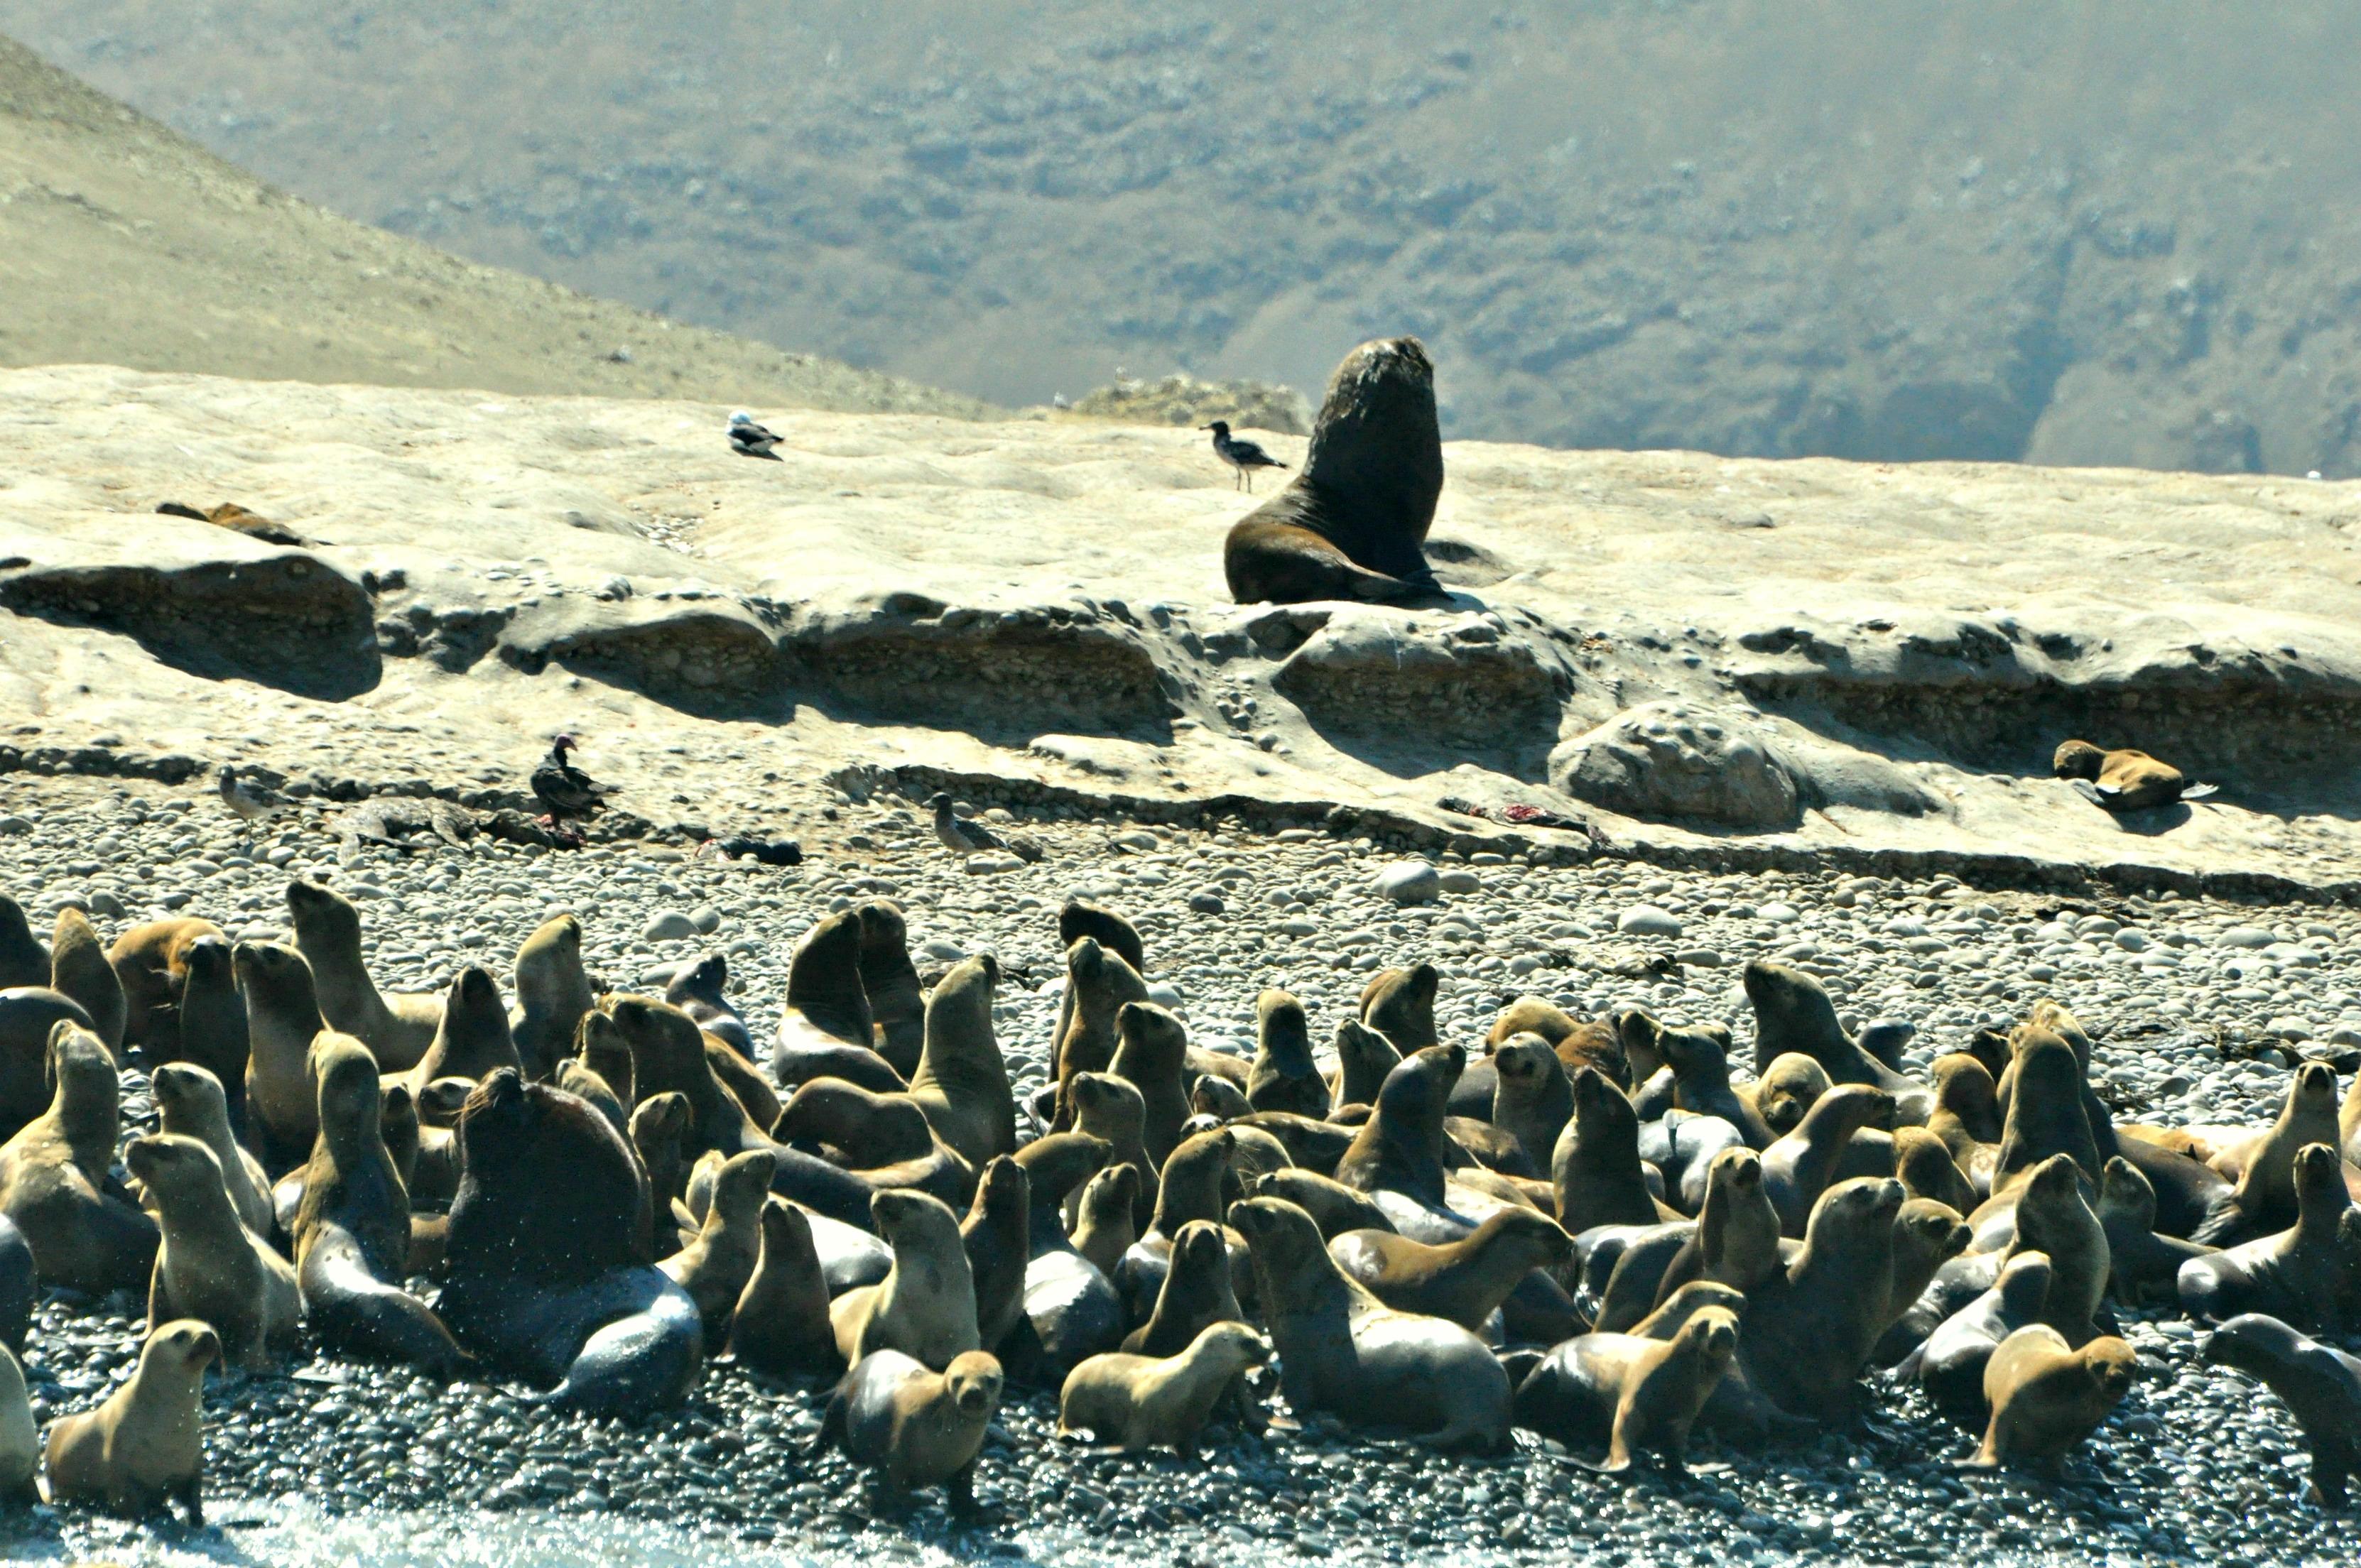 The sea lion king